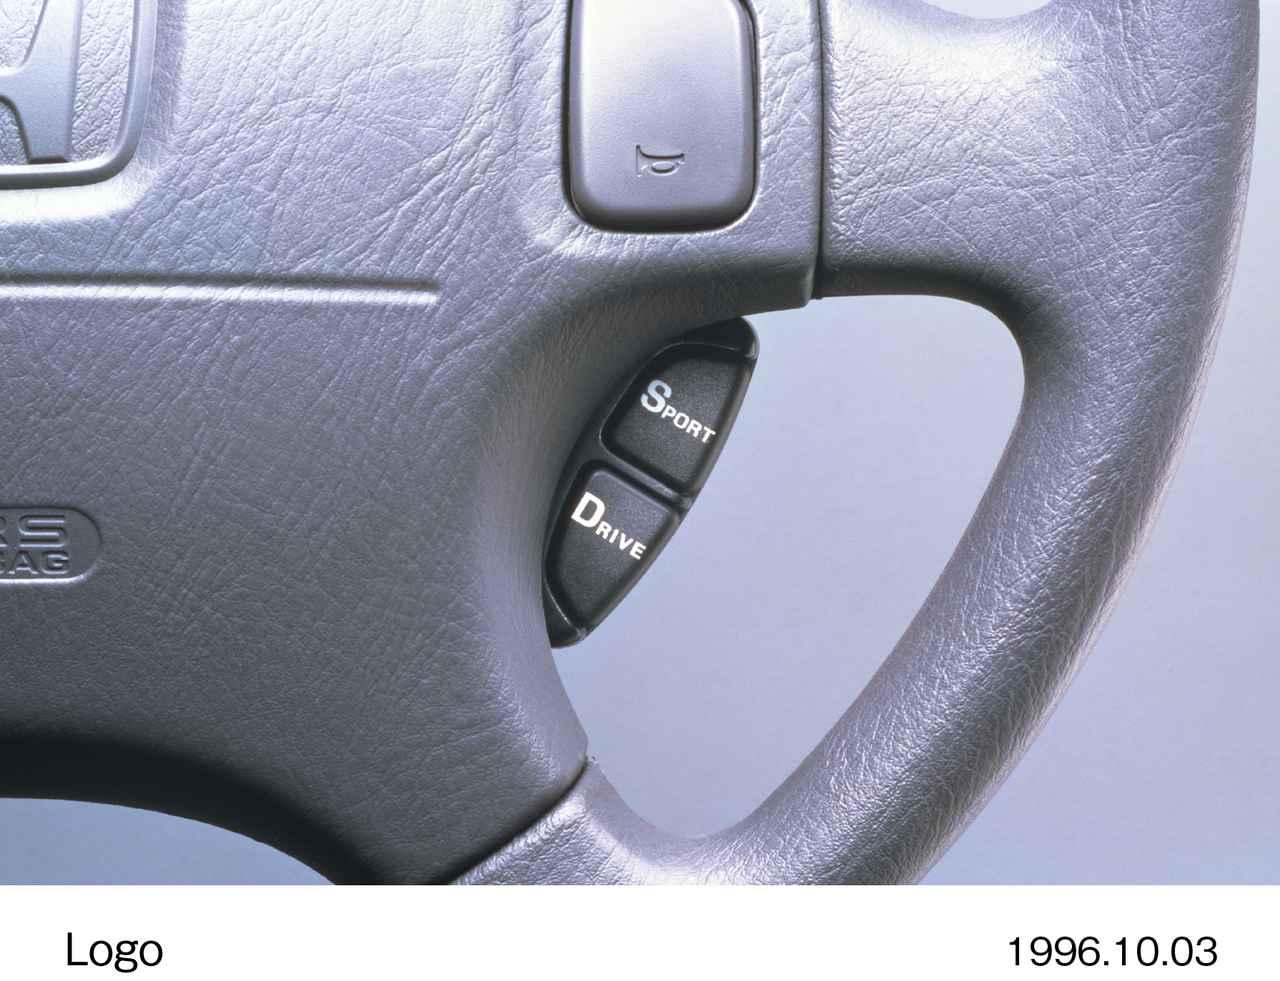 Images : 5番目の画像 - ホンダロゴ関連の画像はこちら(クリックして拡大) - A Little Honda | ア・リトル・ホンダ(リトホン)